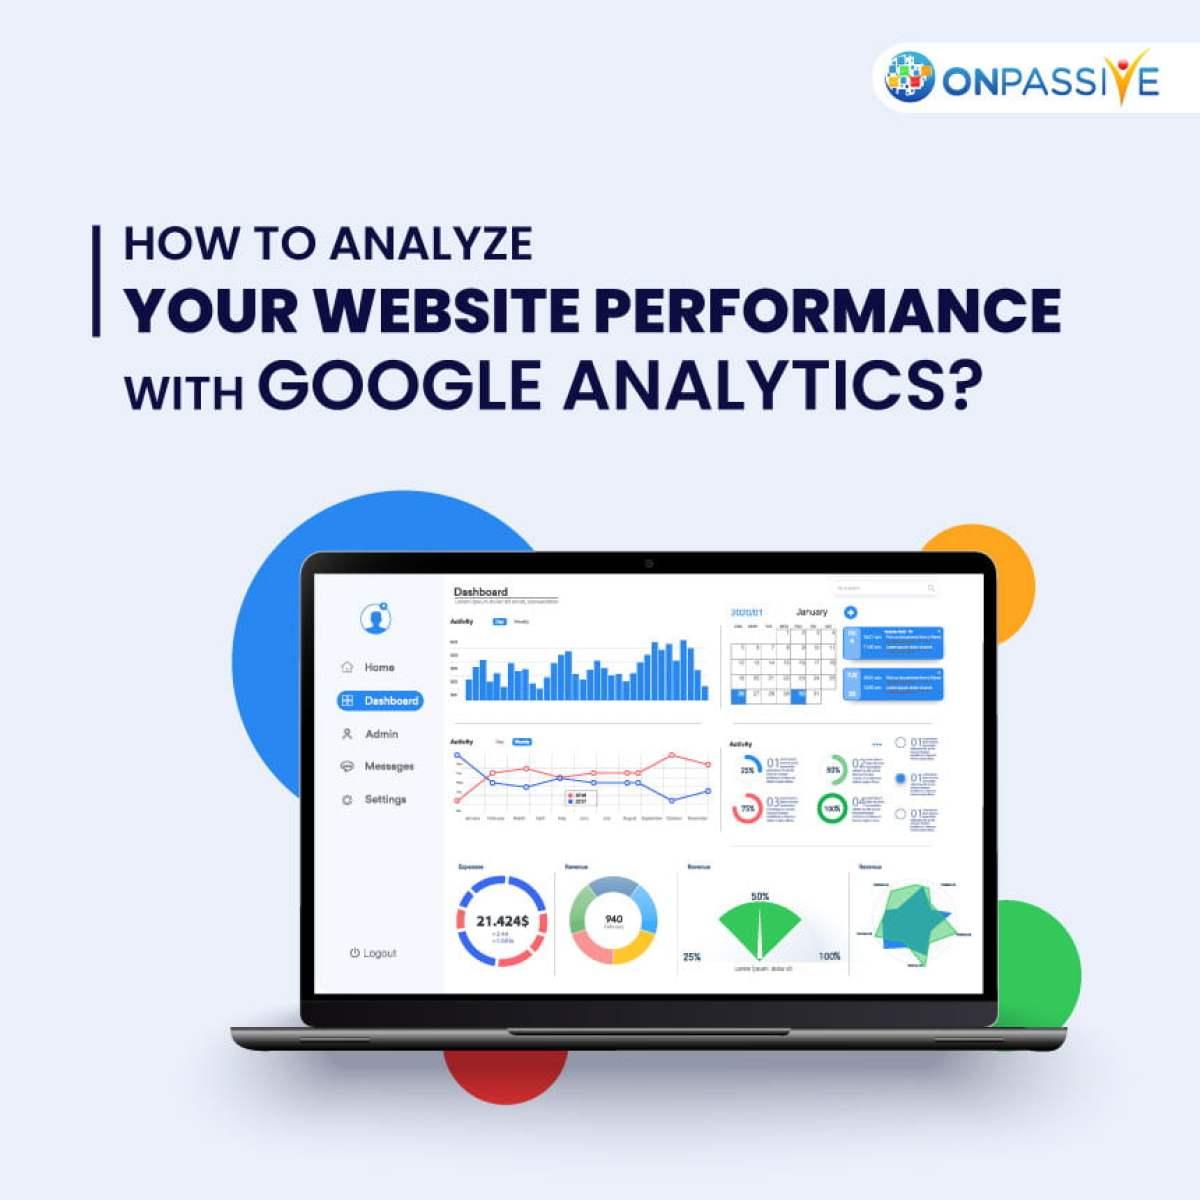 Steps To Analyze Your Website Traffic With Google Analytics